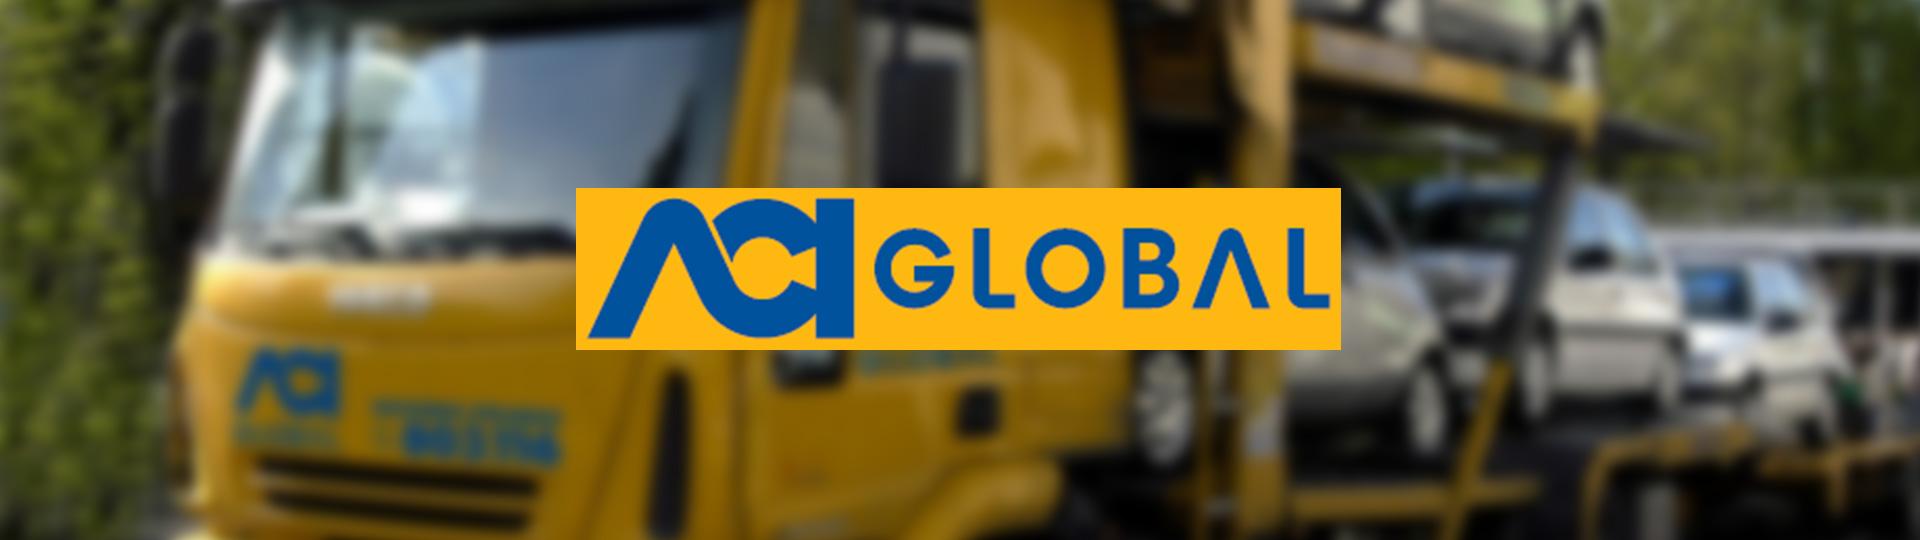 servizi_aci_global.jpg